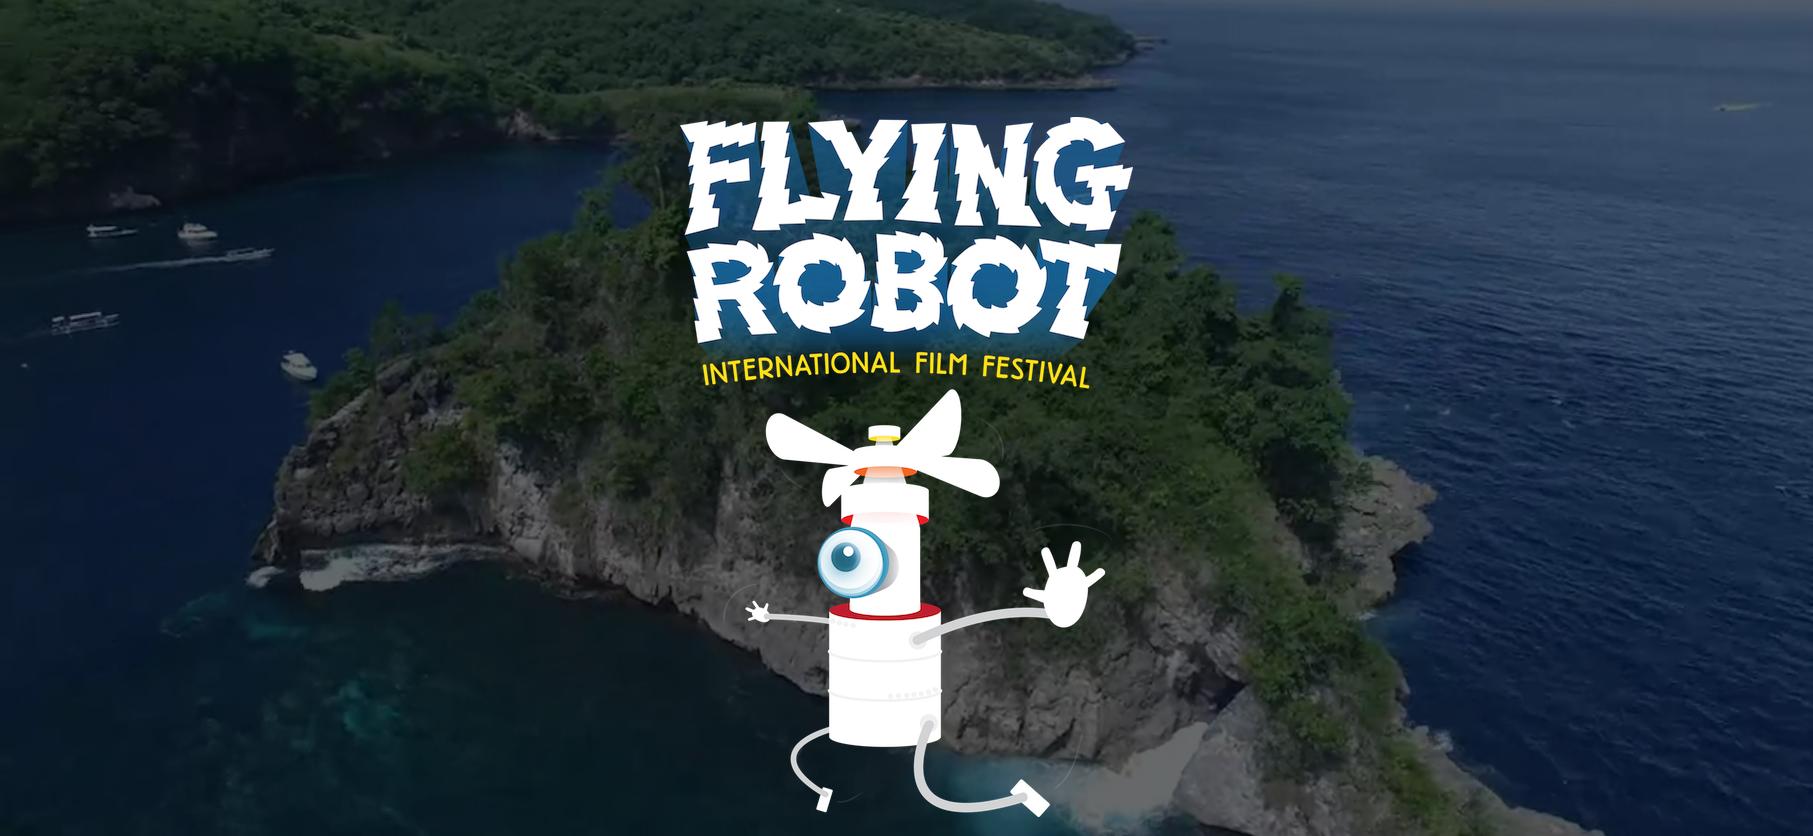 Last day to enter the Flying Robot international Film Festival